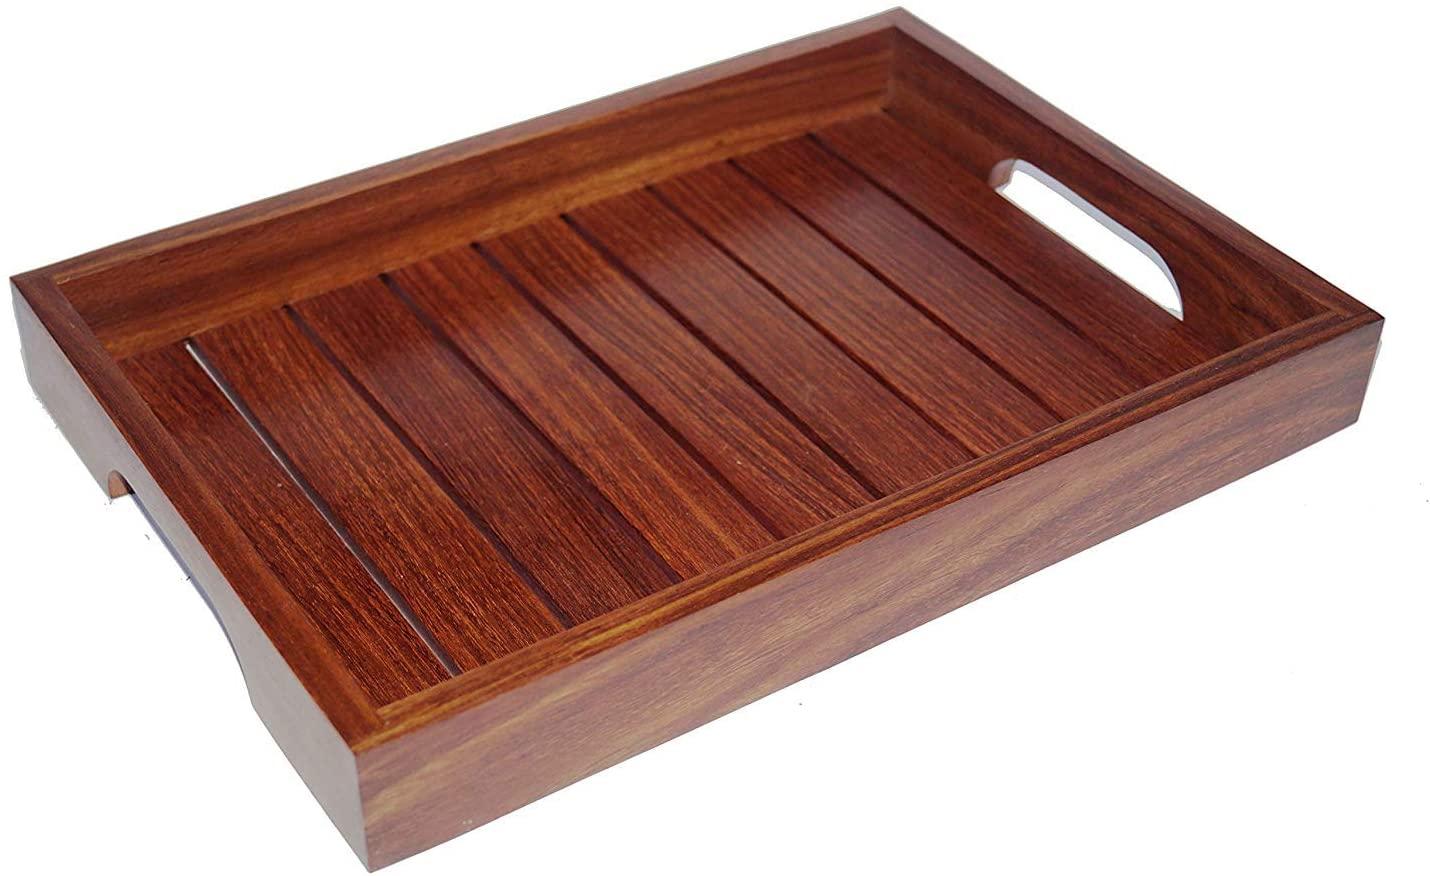 Kesha Spree Indian Rosewood Sheesham Wood Handmade & Handcrafted Wooden Serving Tray...